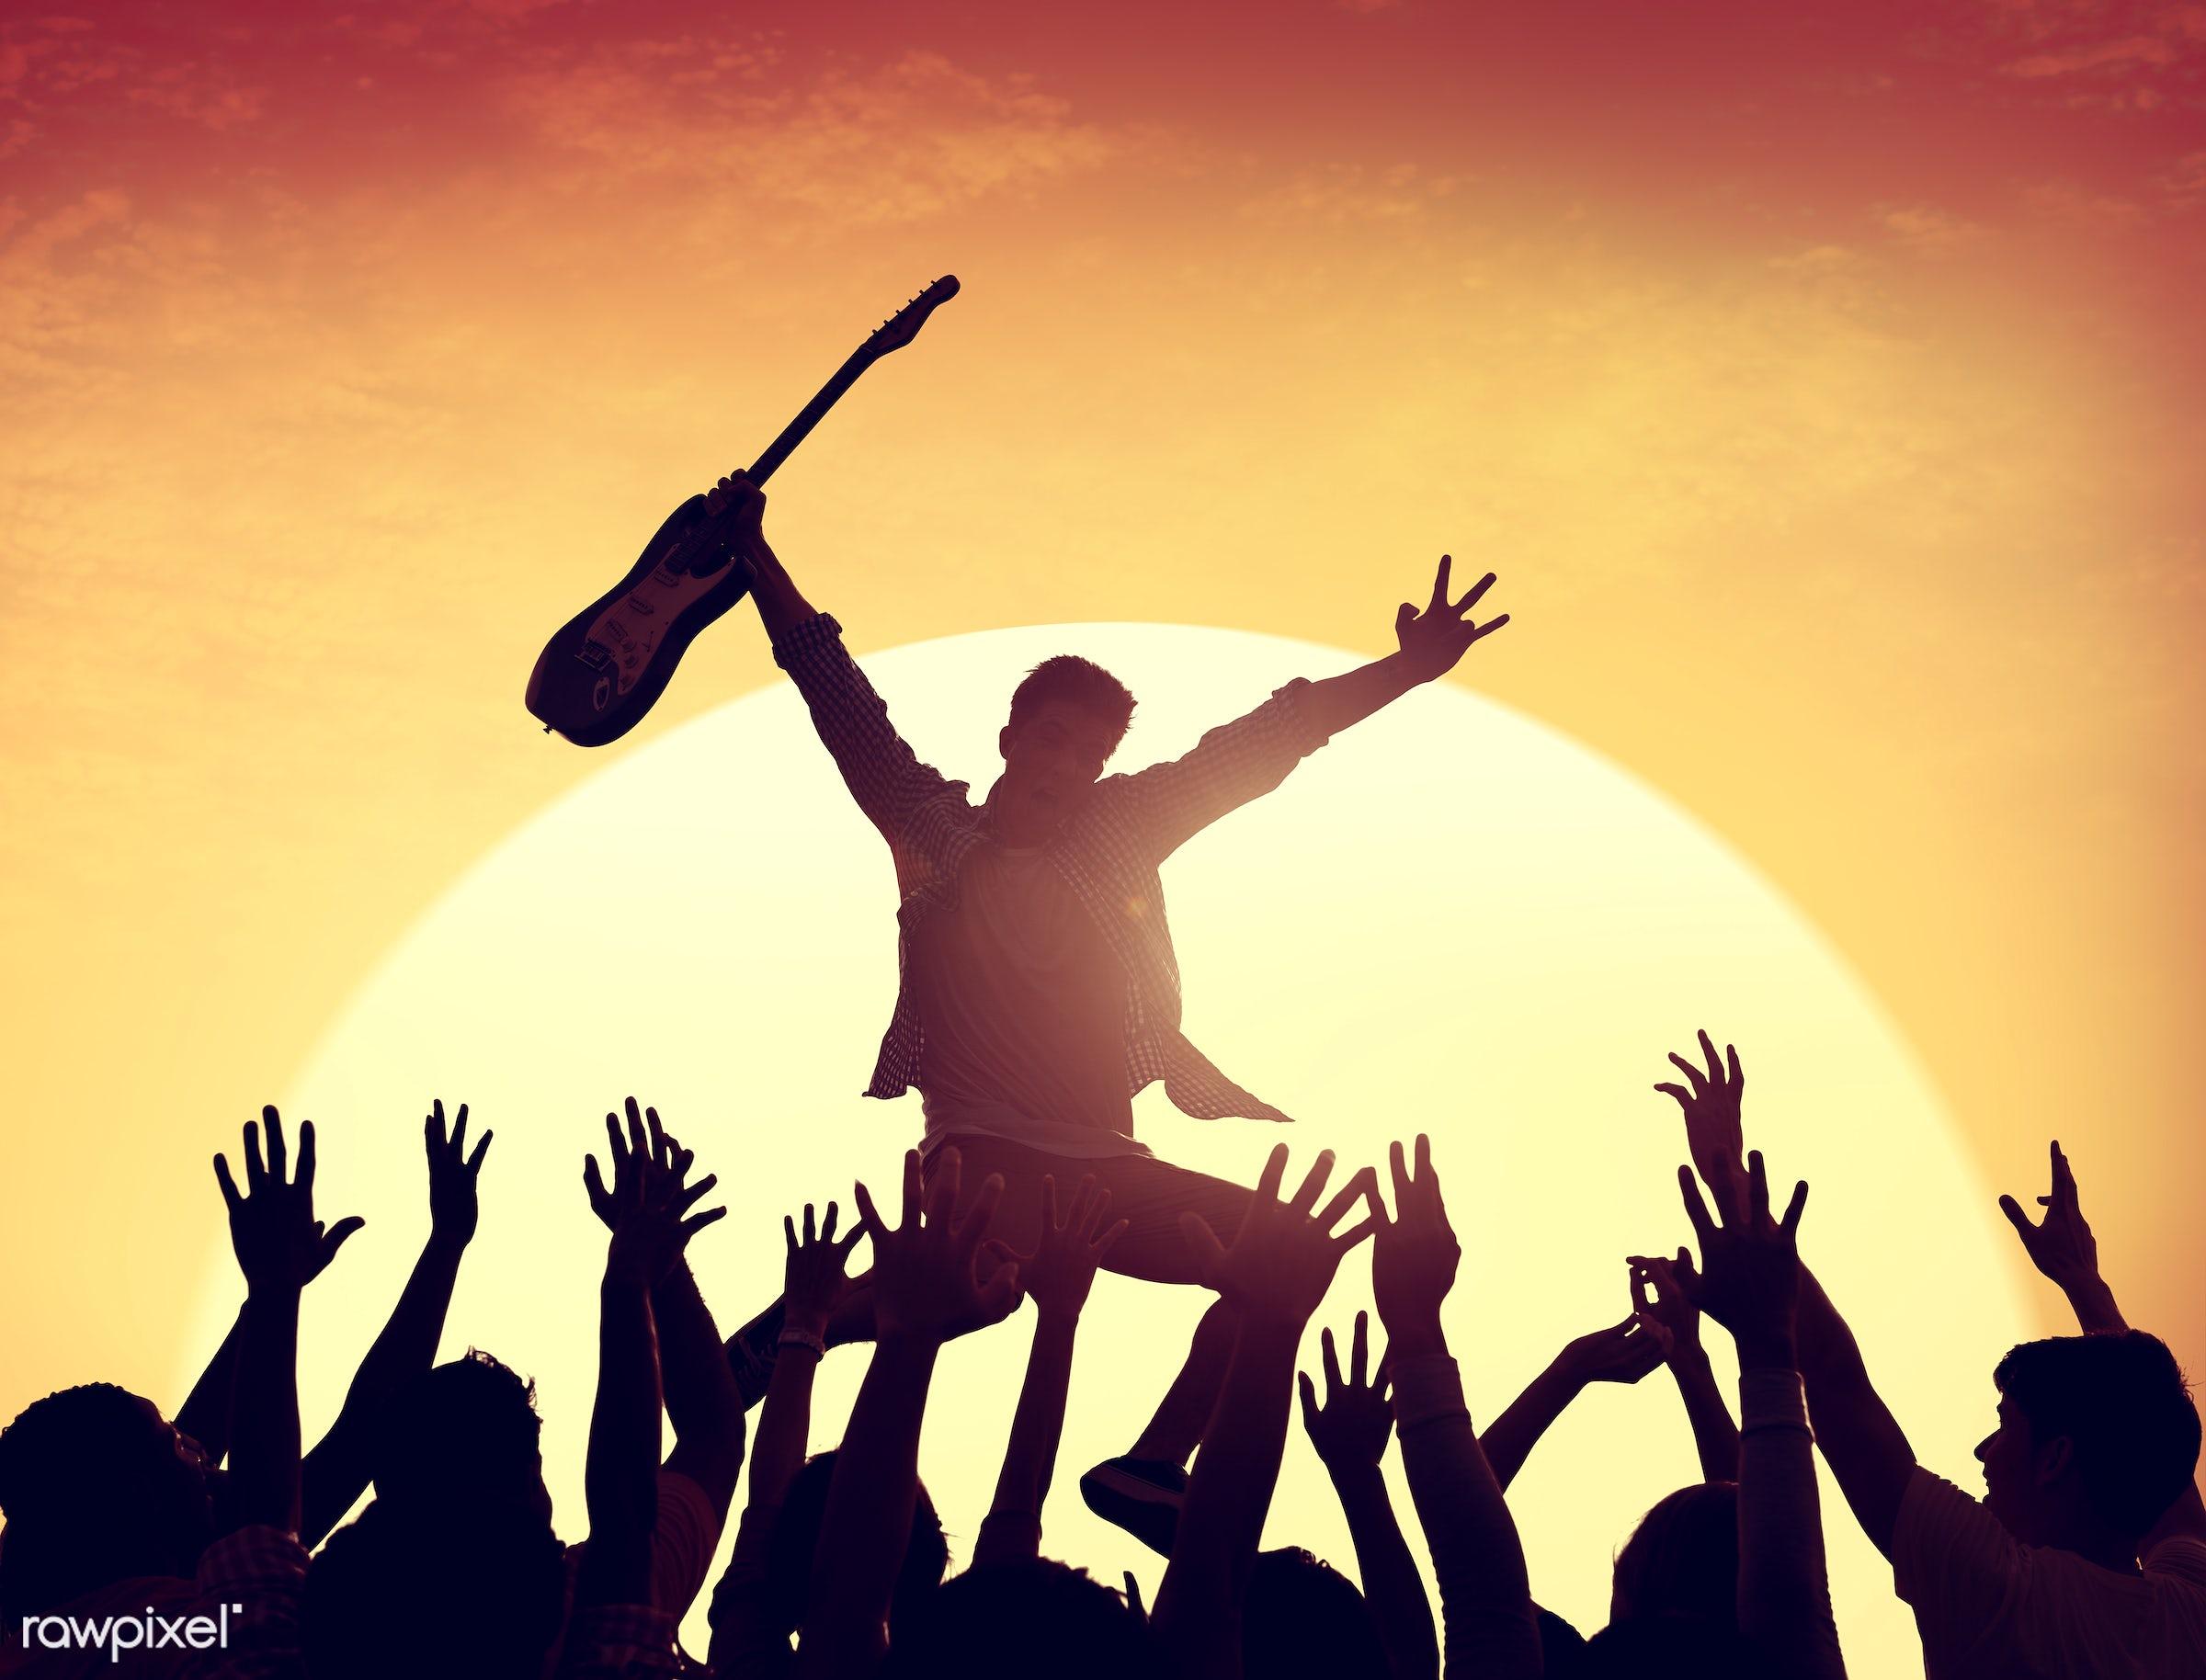 festive, adolescence, arms raised, audience, back lit, carefree, celebration, cheerful, communication, community, concert,...